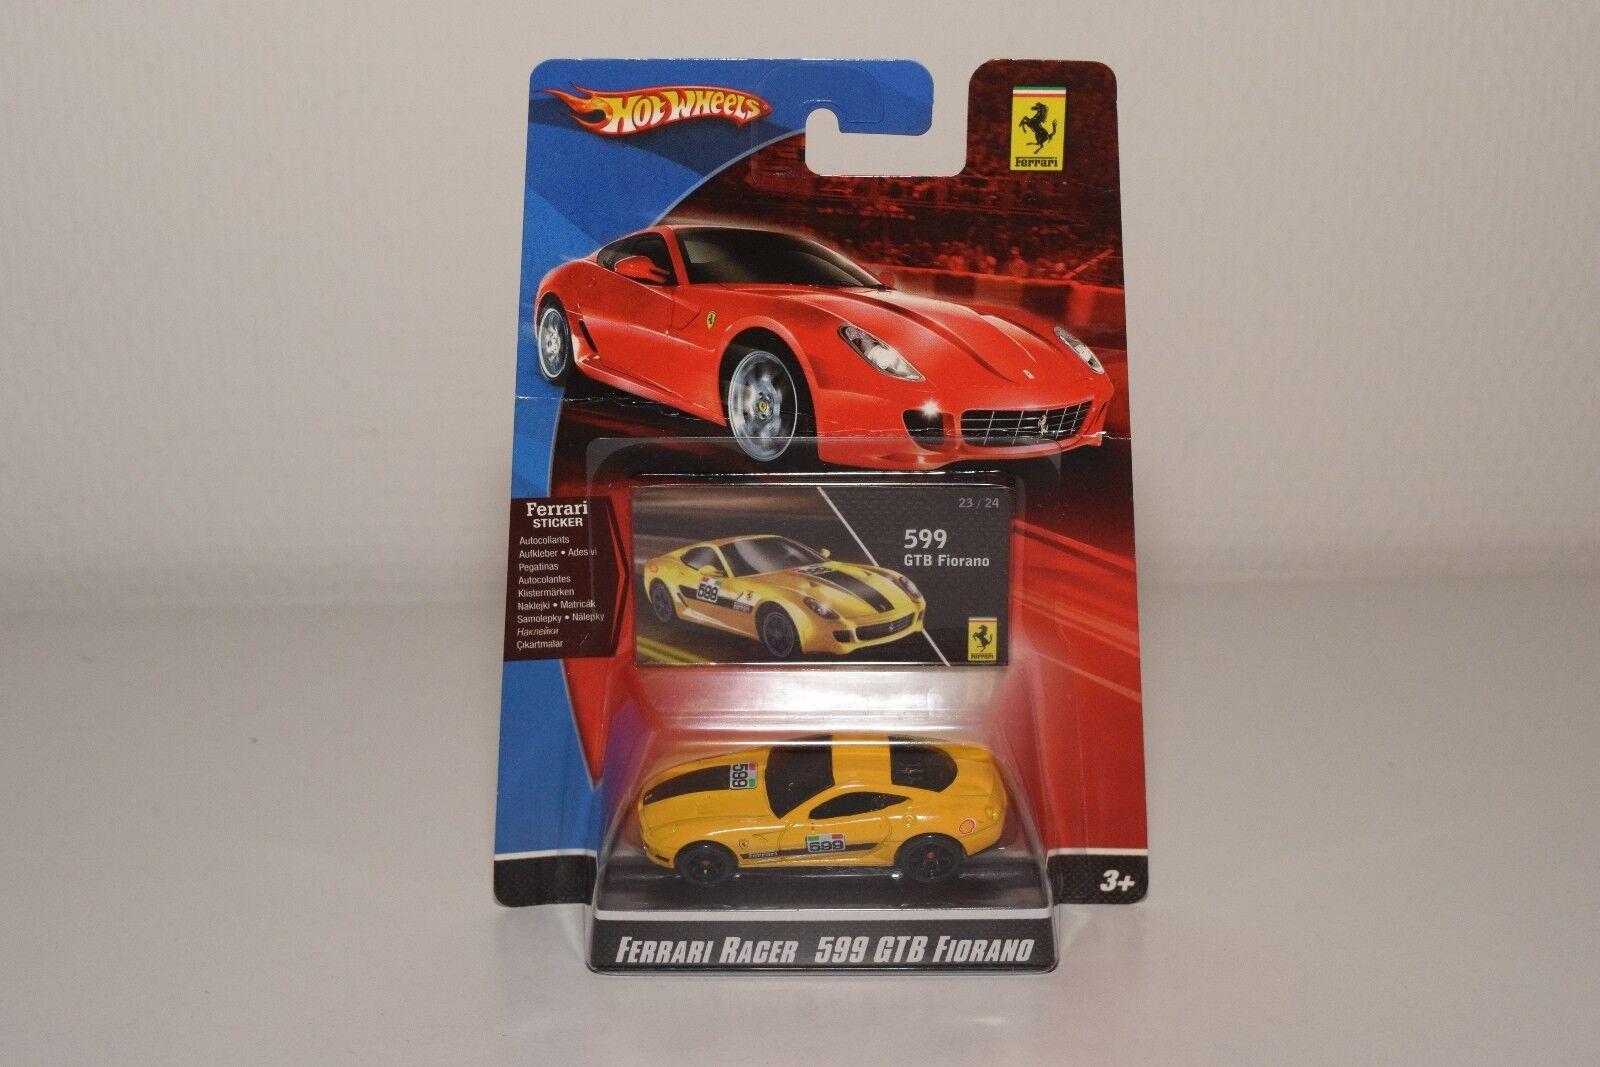 V 1 64 HOTWHEELS RACER FERRARI 599 GTB 599GTB FIORANO YELLOW MINT ON CARD RARE